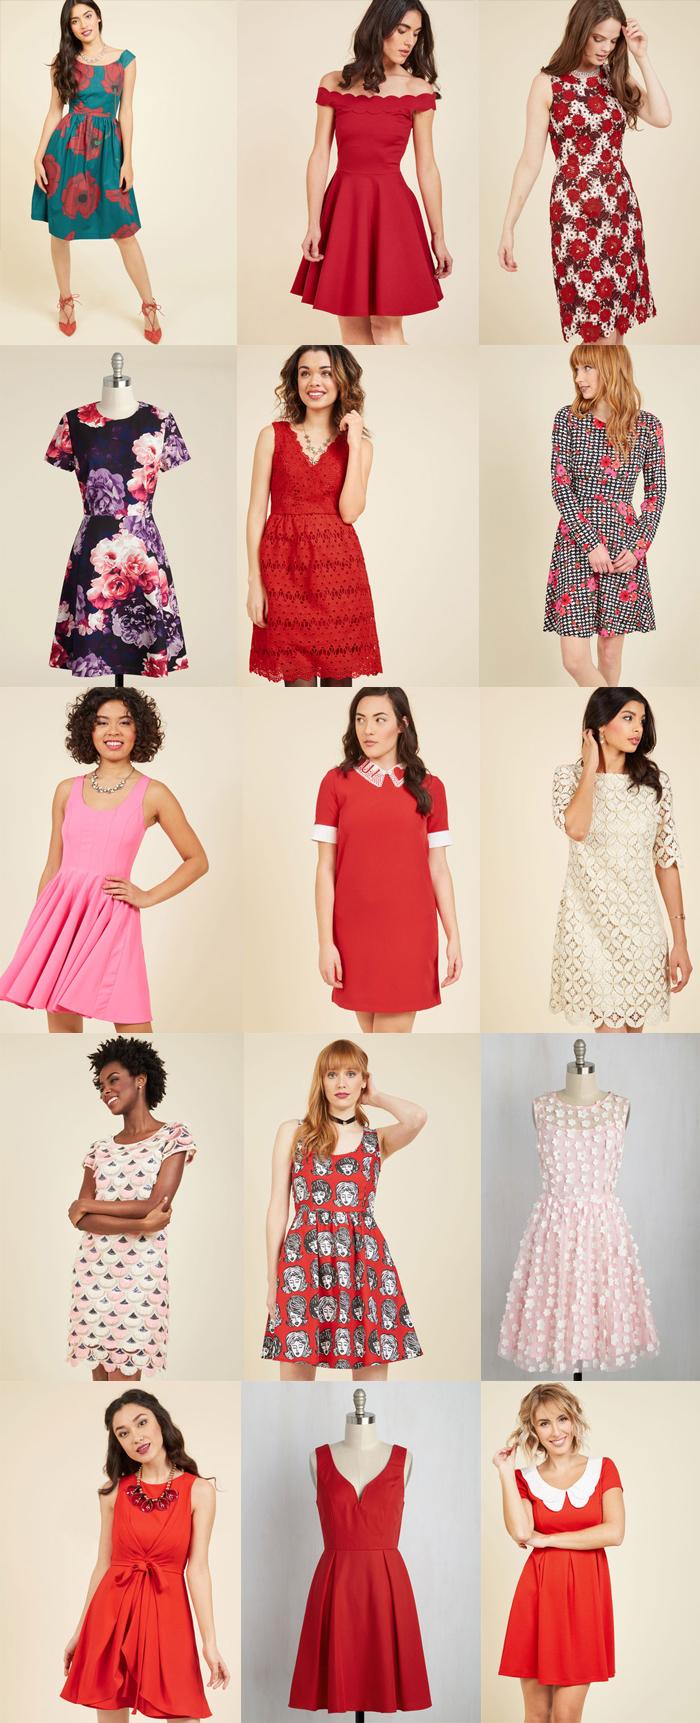 modcloth valentines dresses